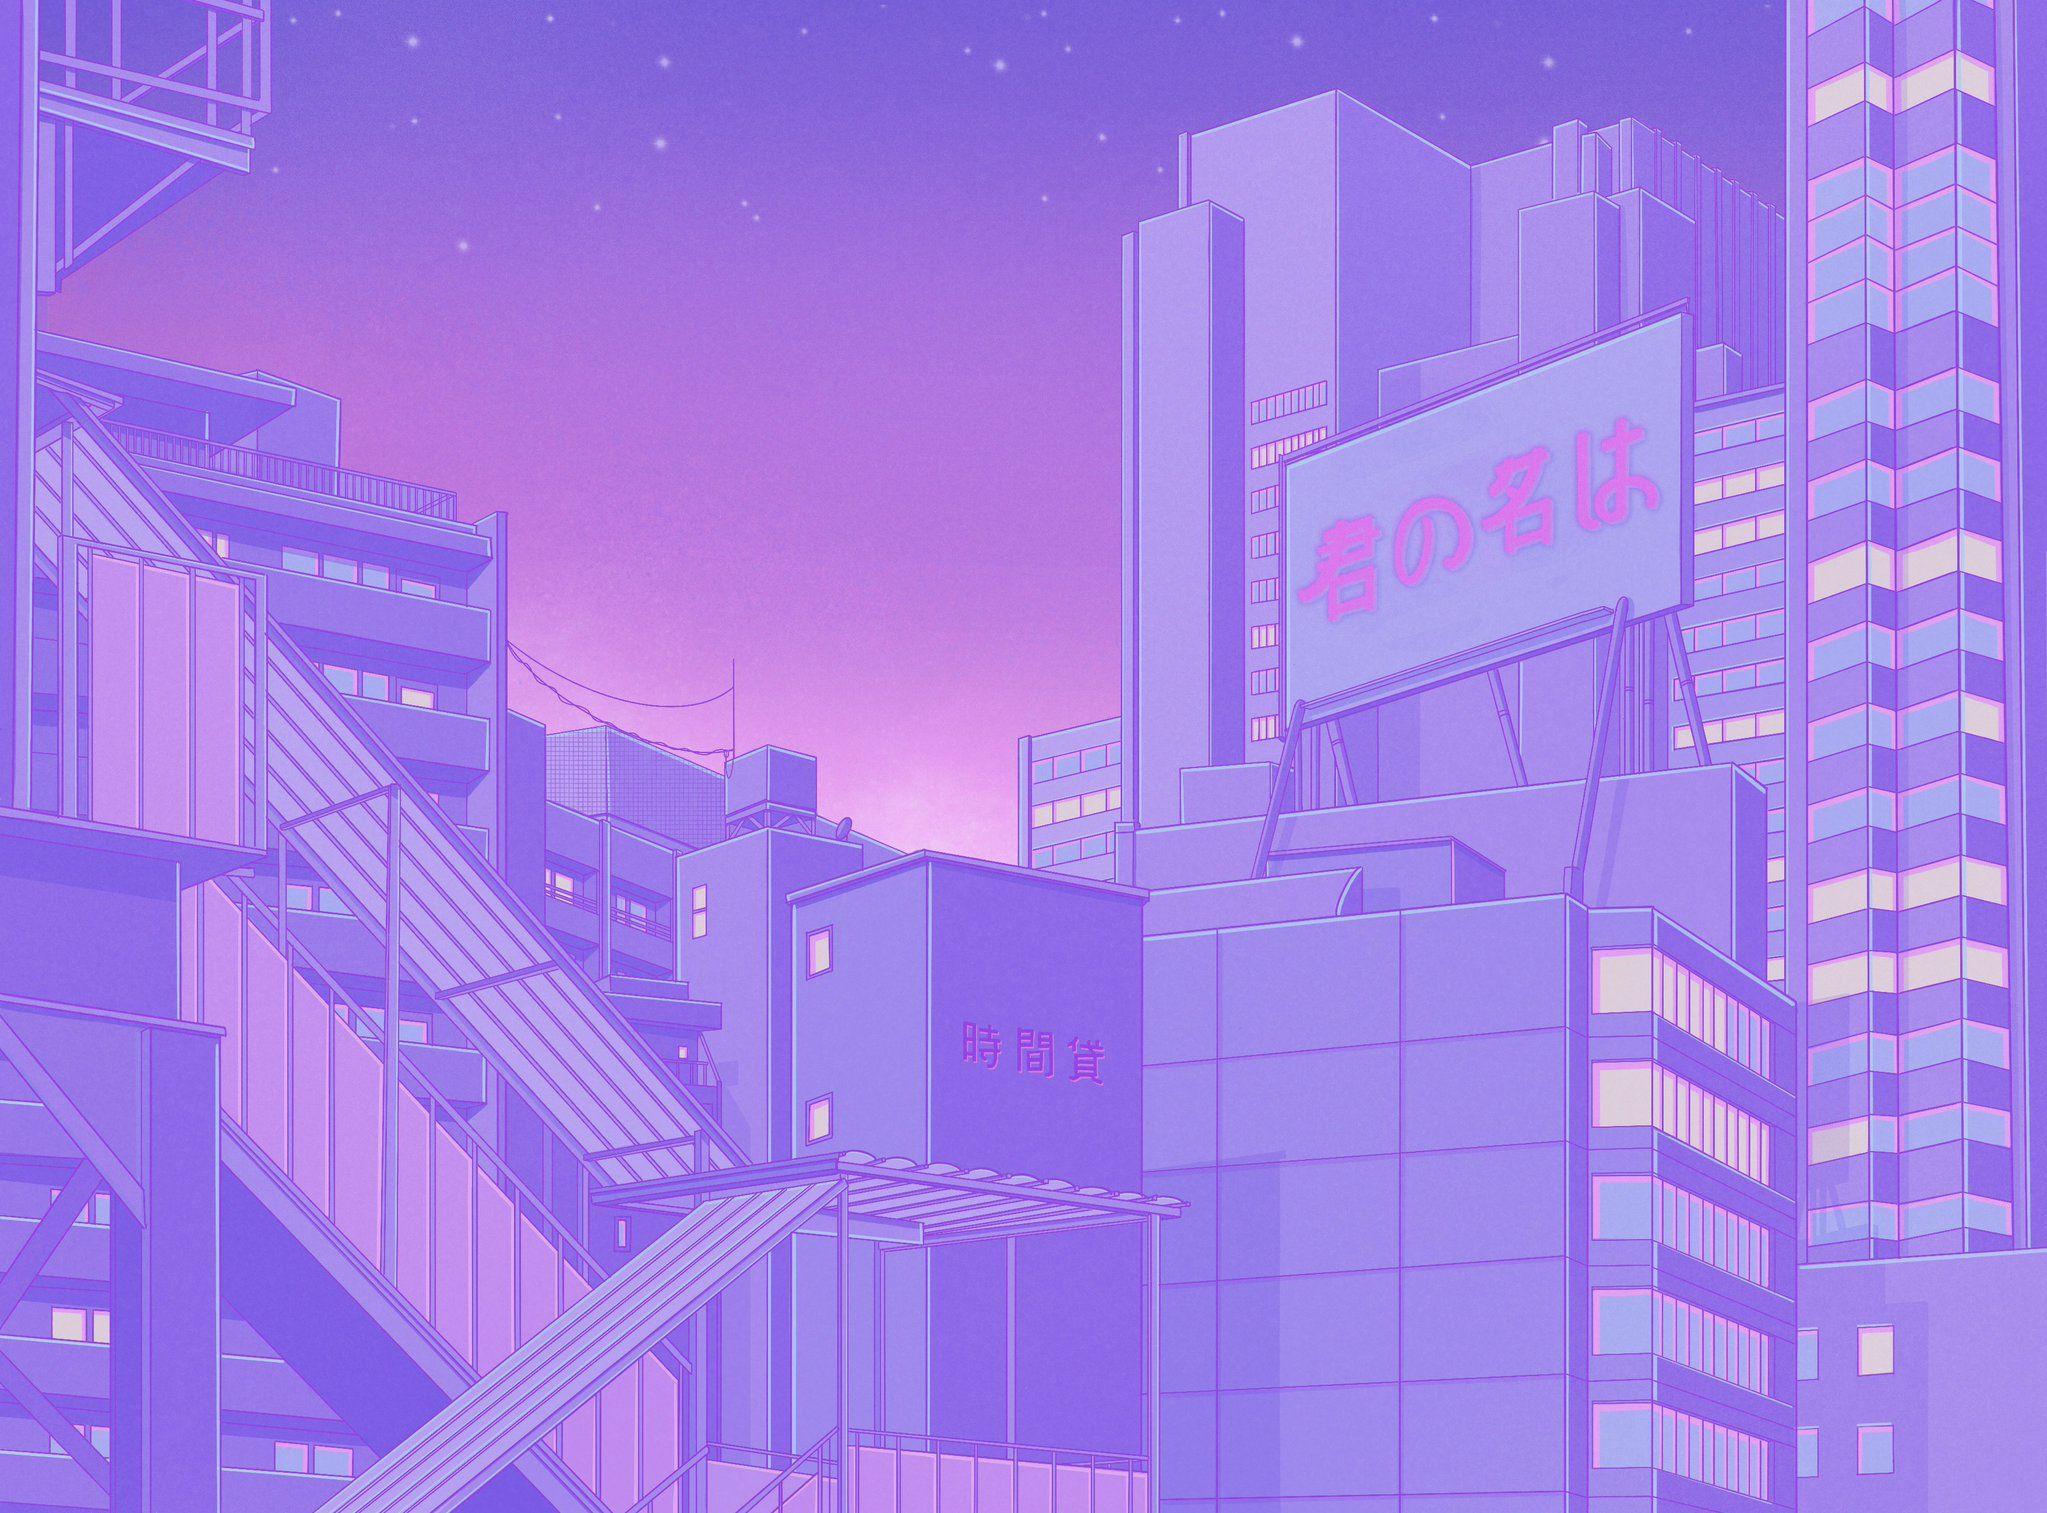 Ig Astartch Aesthetic Anime Aesthetic Pastel Wallpaper Anime Background